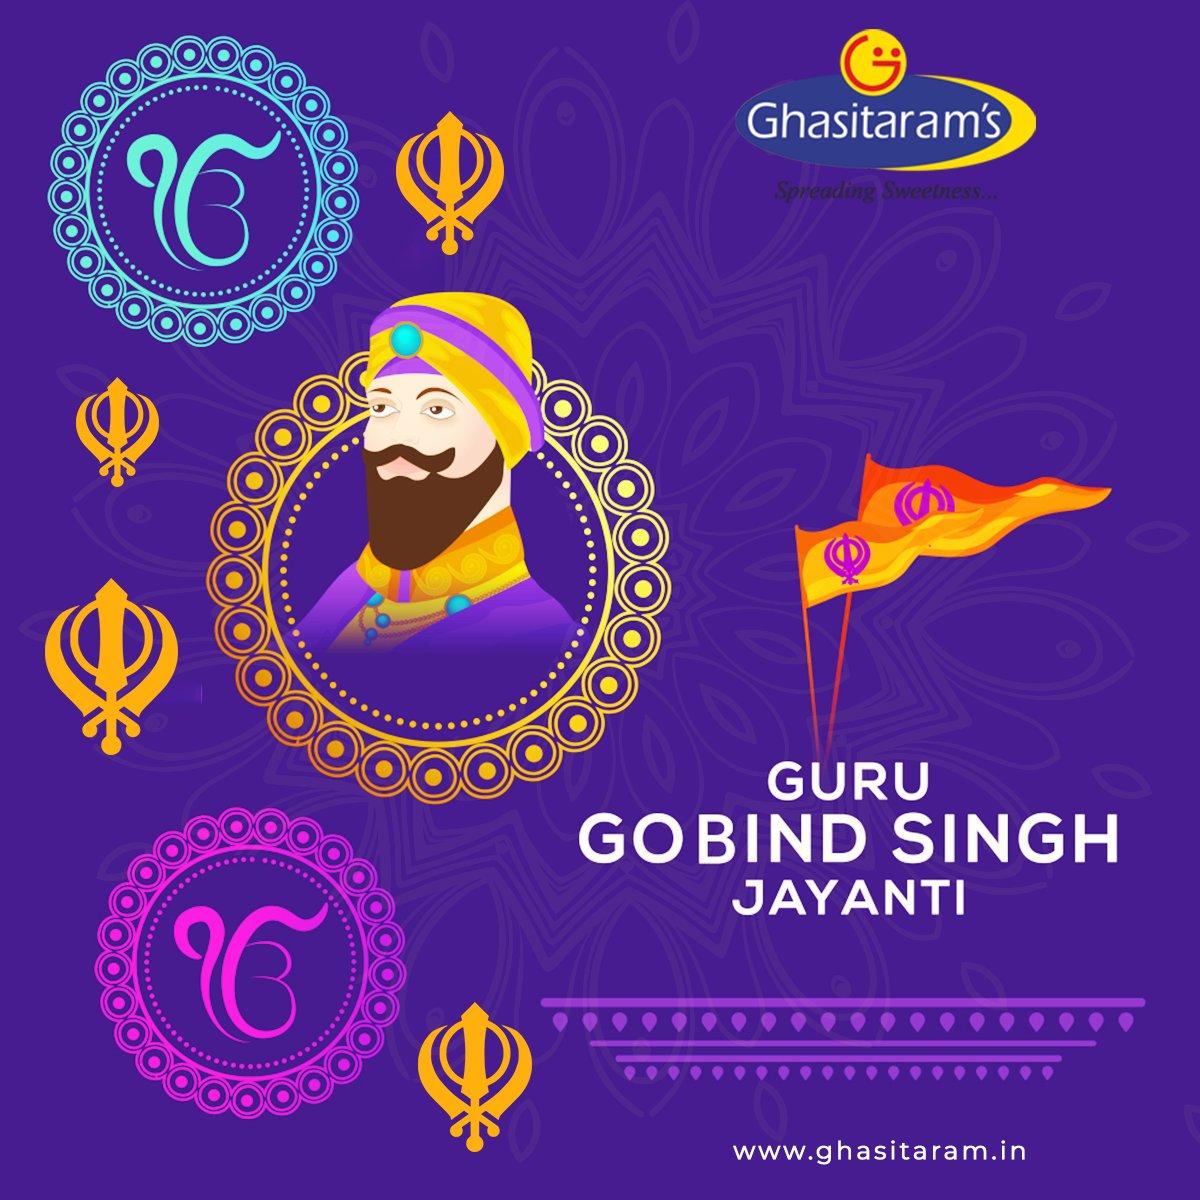 You cannot forget the option of Doing Good for society at large - #GuruGobindSingh ji @Ghasitaram1 Salutes the Great Warrior on his Jayanti  #ghasitarams #गुरु_गोविंद_सिंह_जयंती #gurugobindsinghjayanti #gurugobindjayanti2021 #happygurugobindjayanti #Mumbai #Delhi #punjab